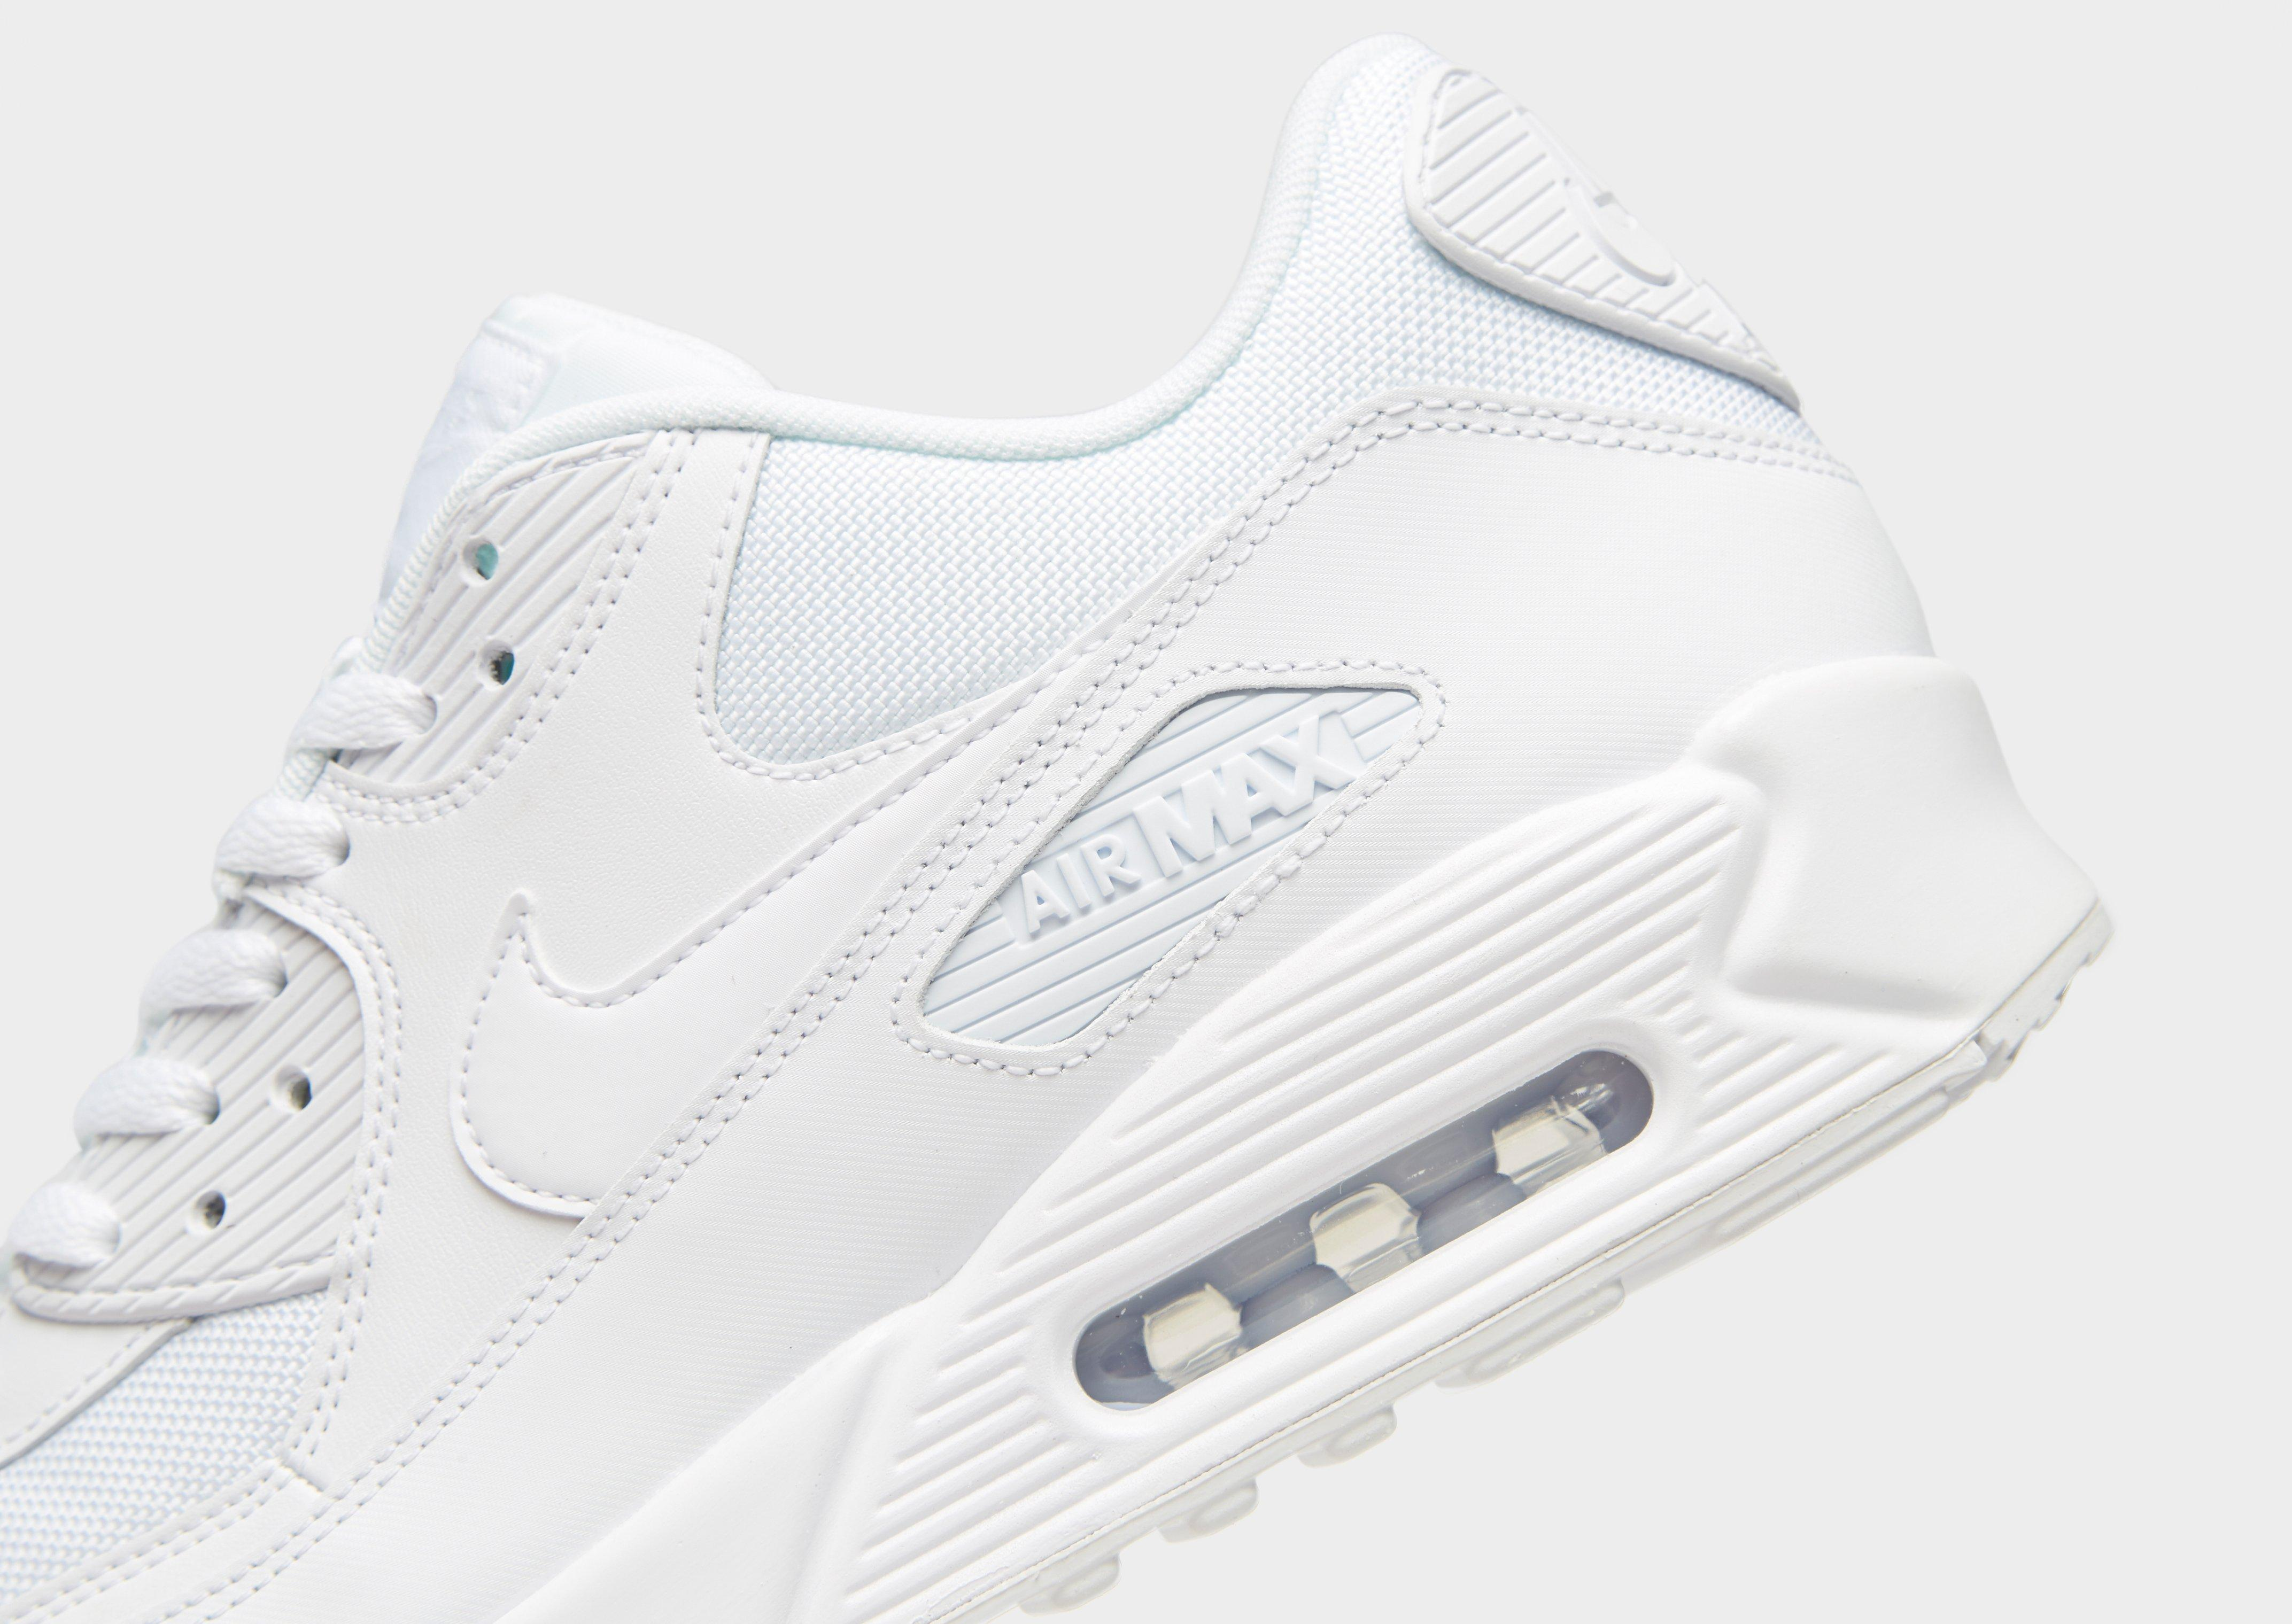 nike air max 90 in white